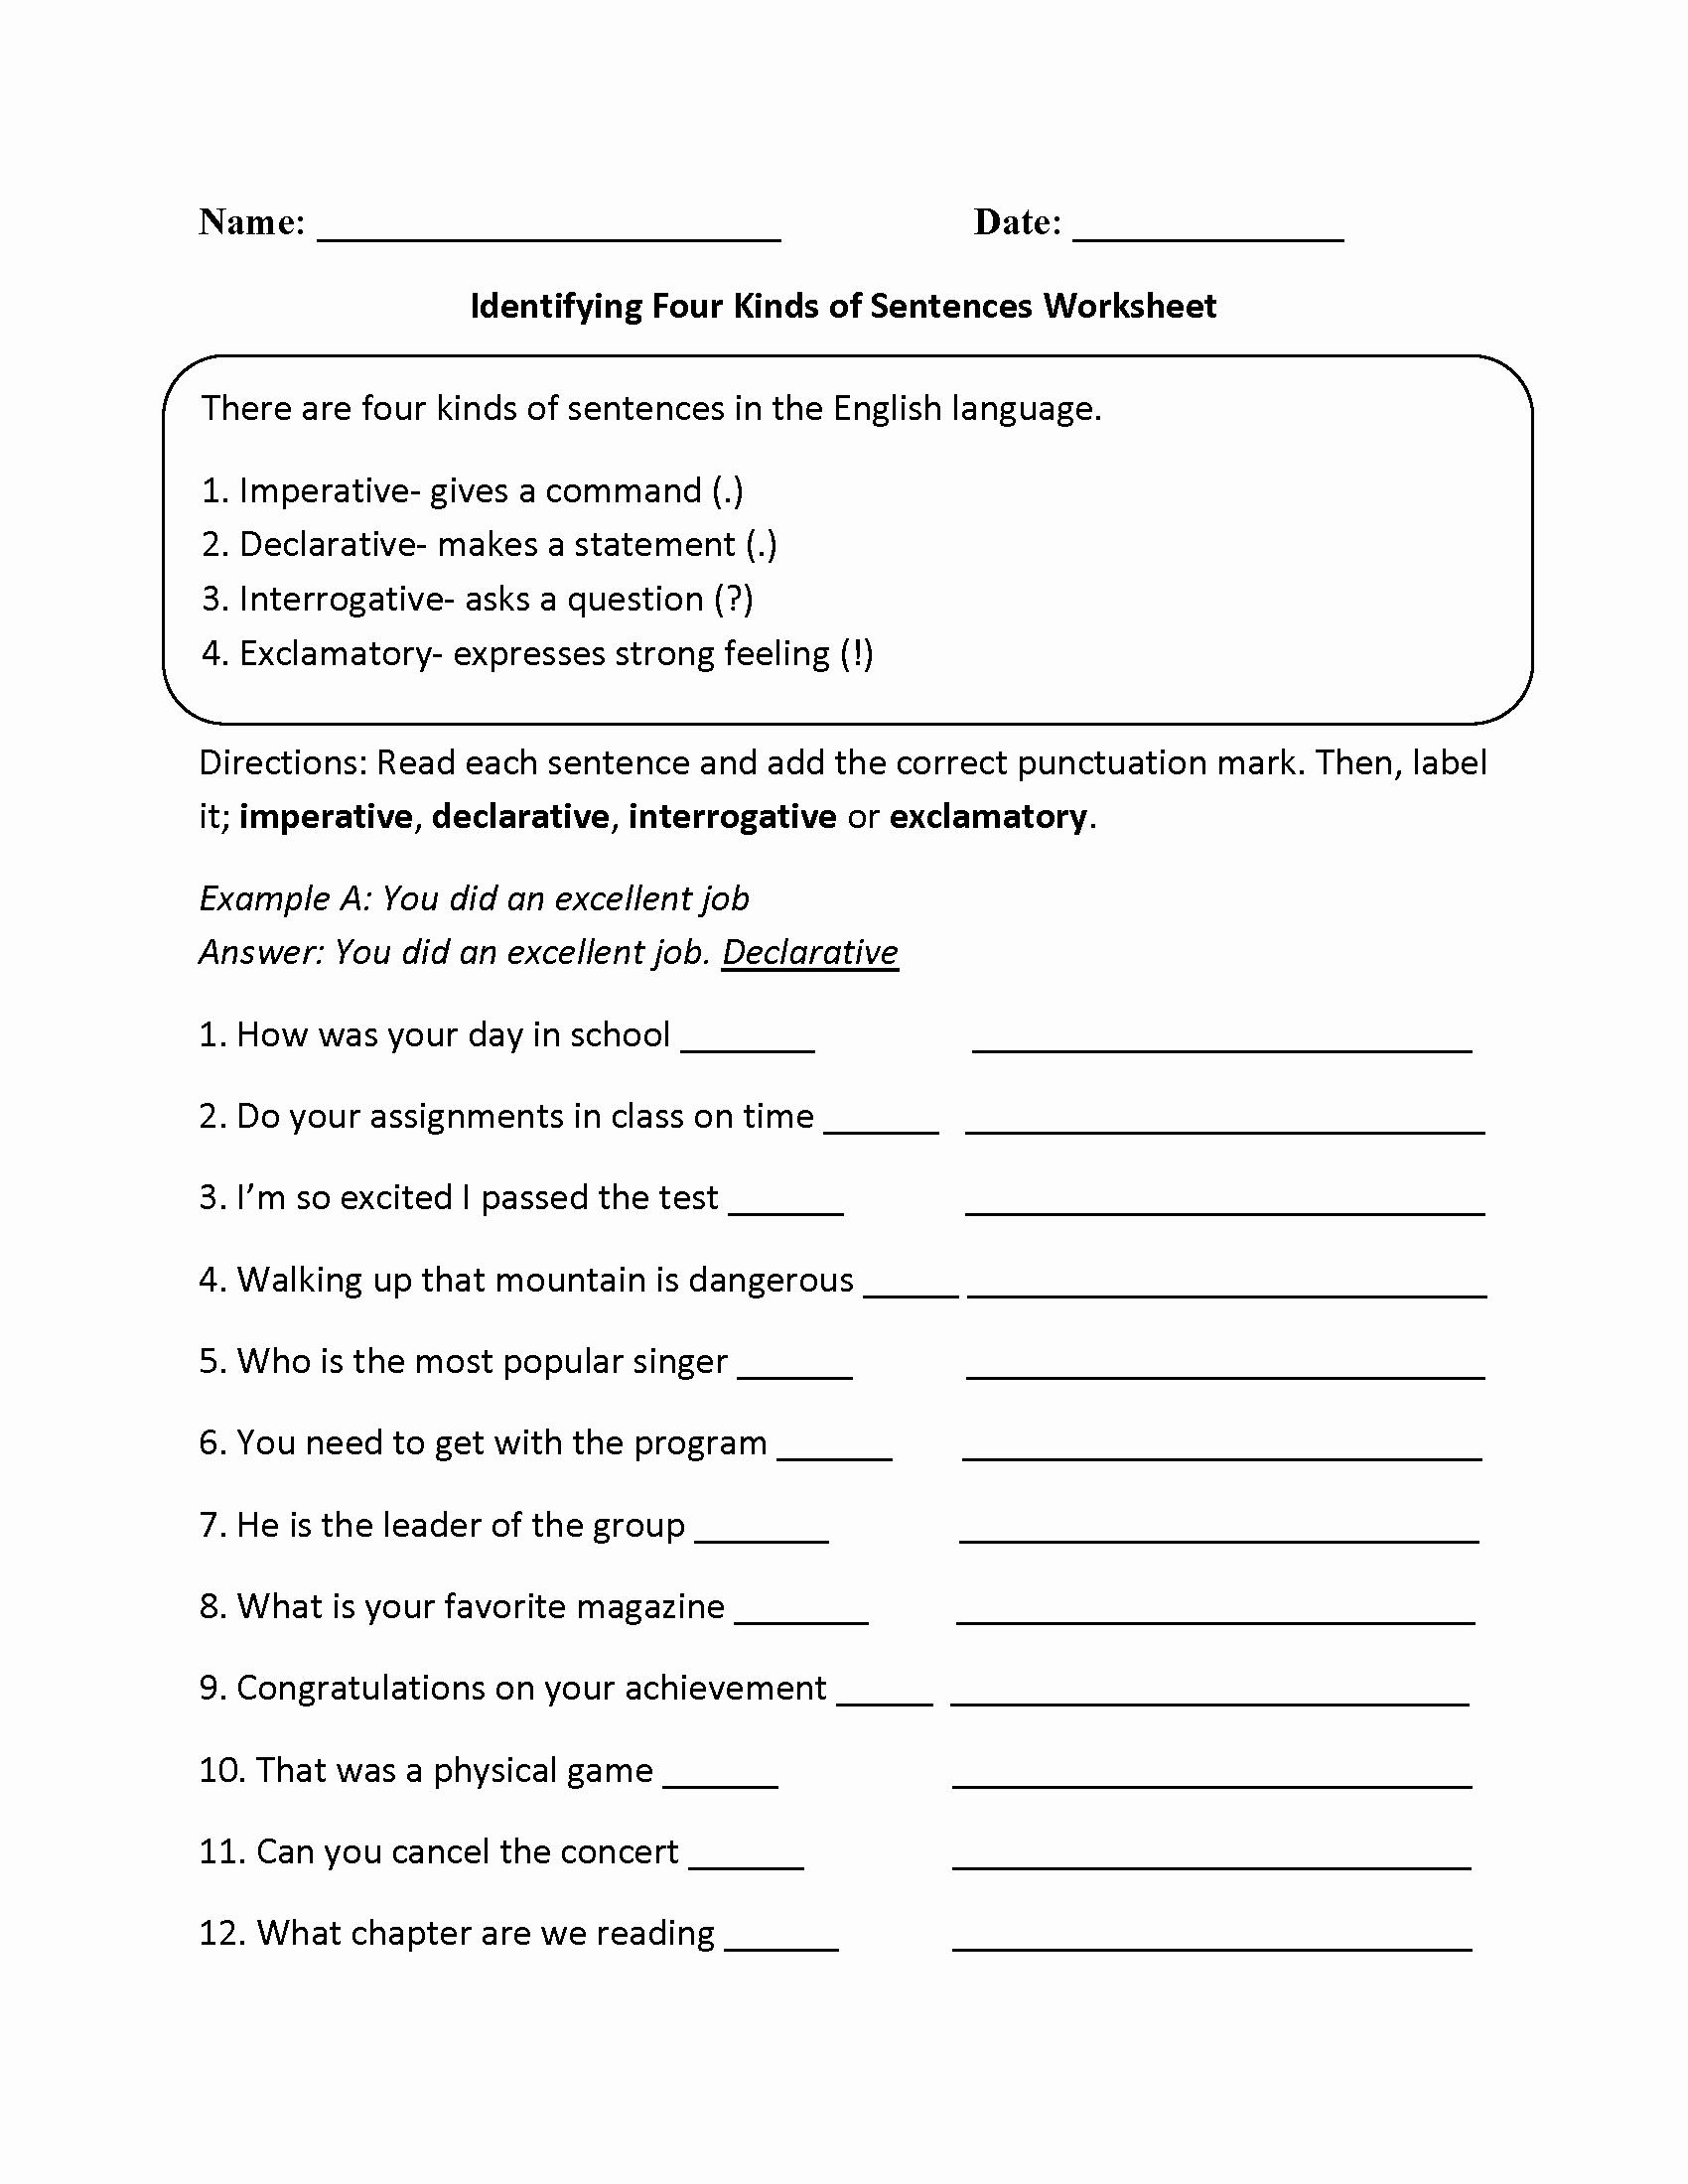 Four Kinds Of Sentences Worksheets Unique 8 Best Of Four Types Conflict Worksheet Types